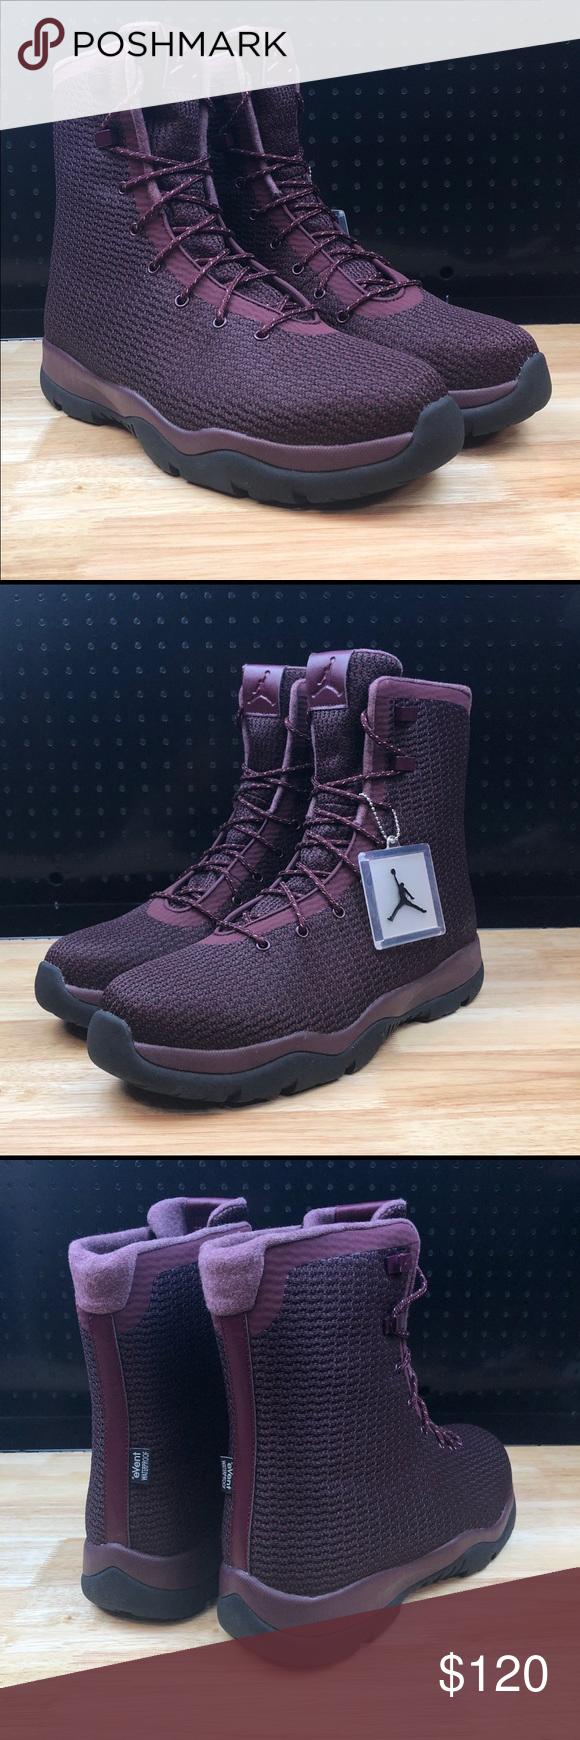 901bb24539dc49 Nike Air Jordan Future Boots Night Maroon Burgundy Nike Air Jordan Future  Boots Night Maroon Red